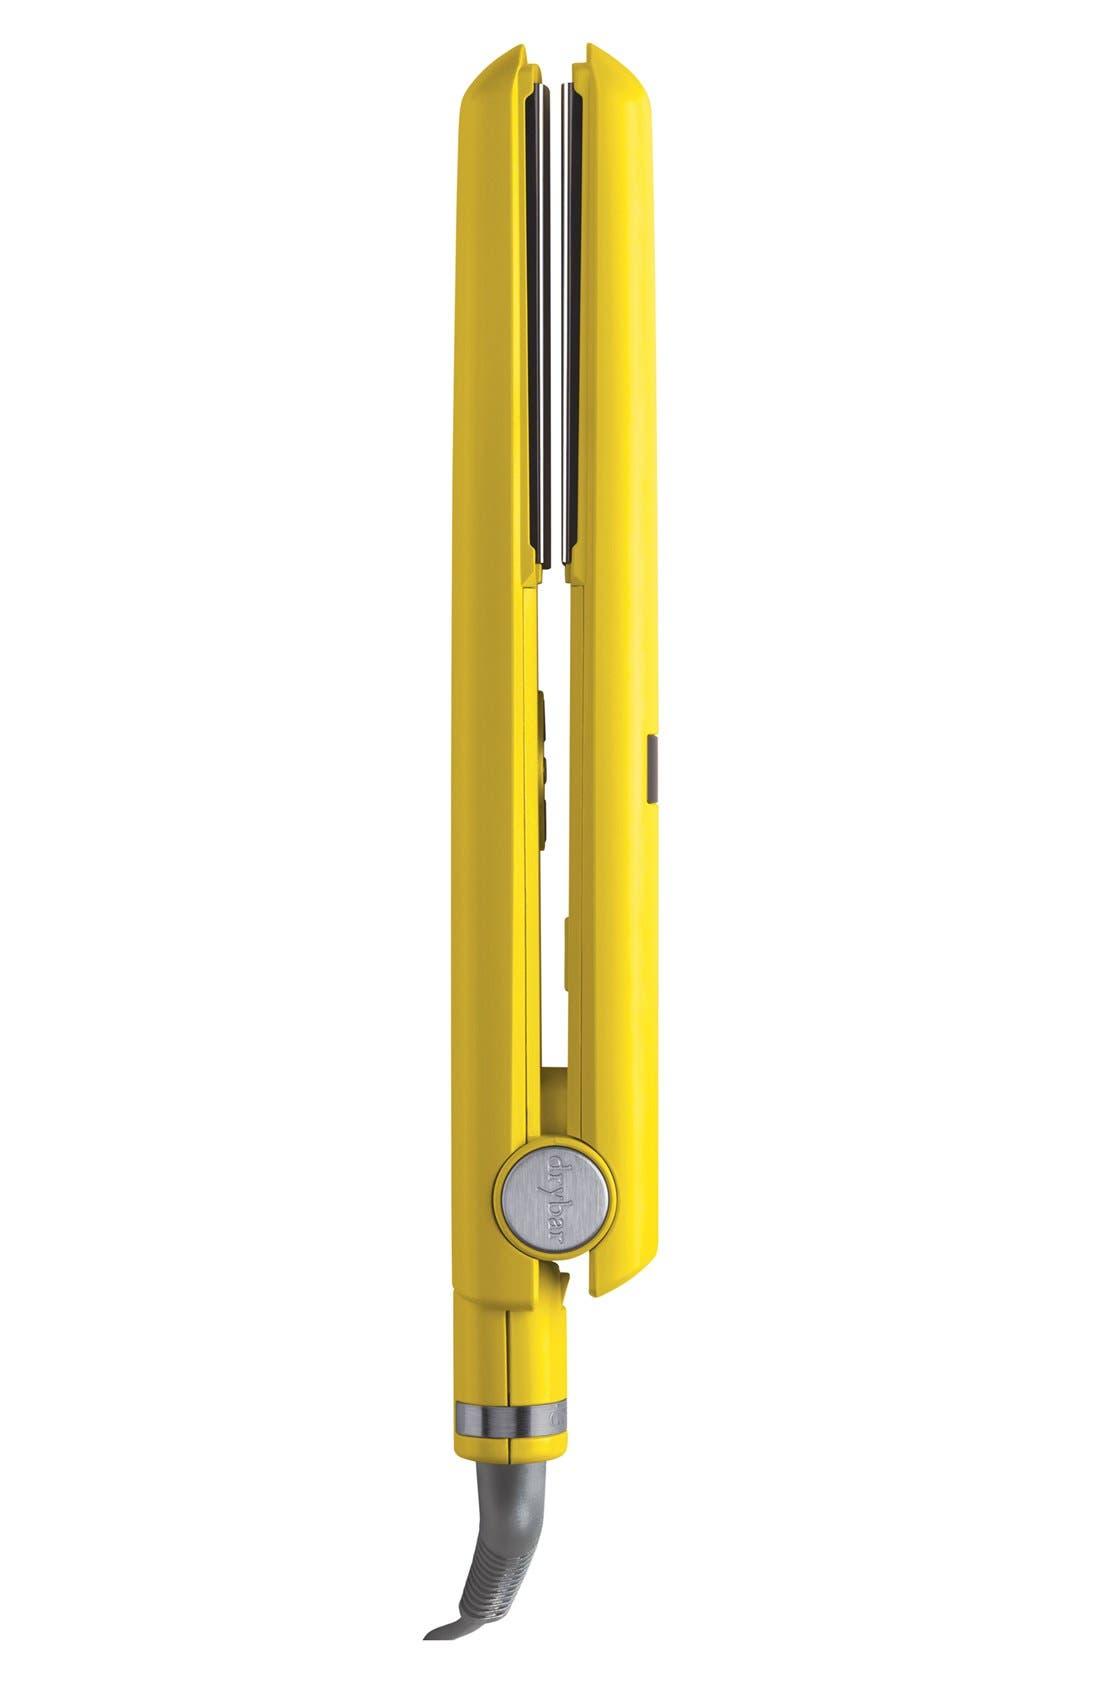 DRYBAR 'The Tress Press' Digital Styling Iron, Main, color, 000